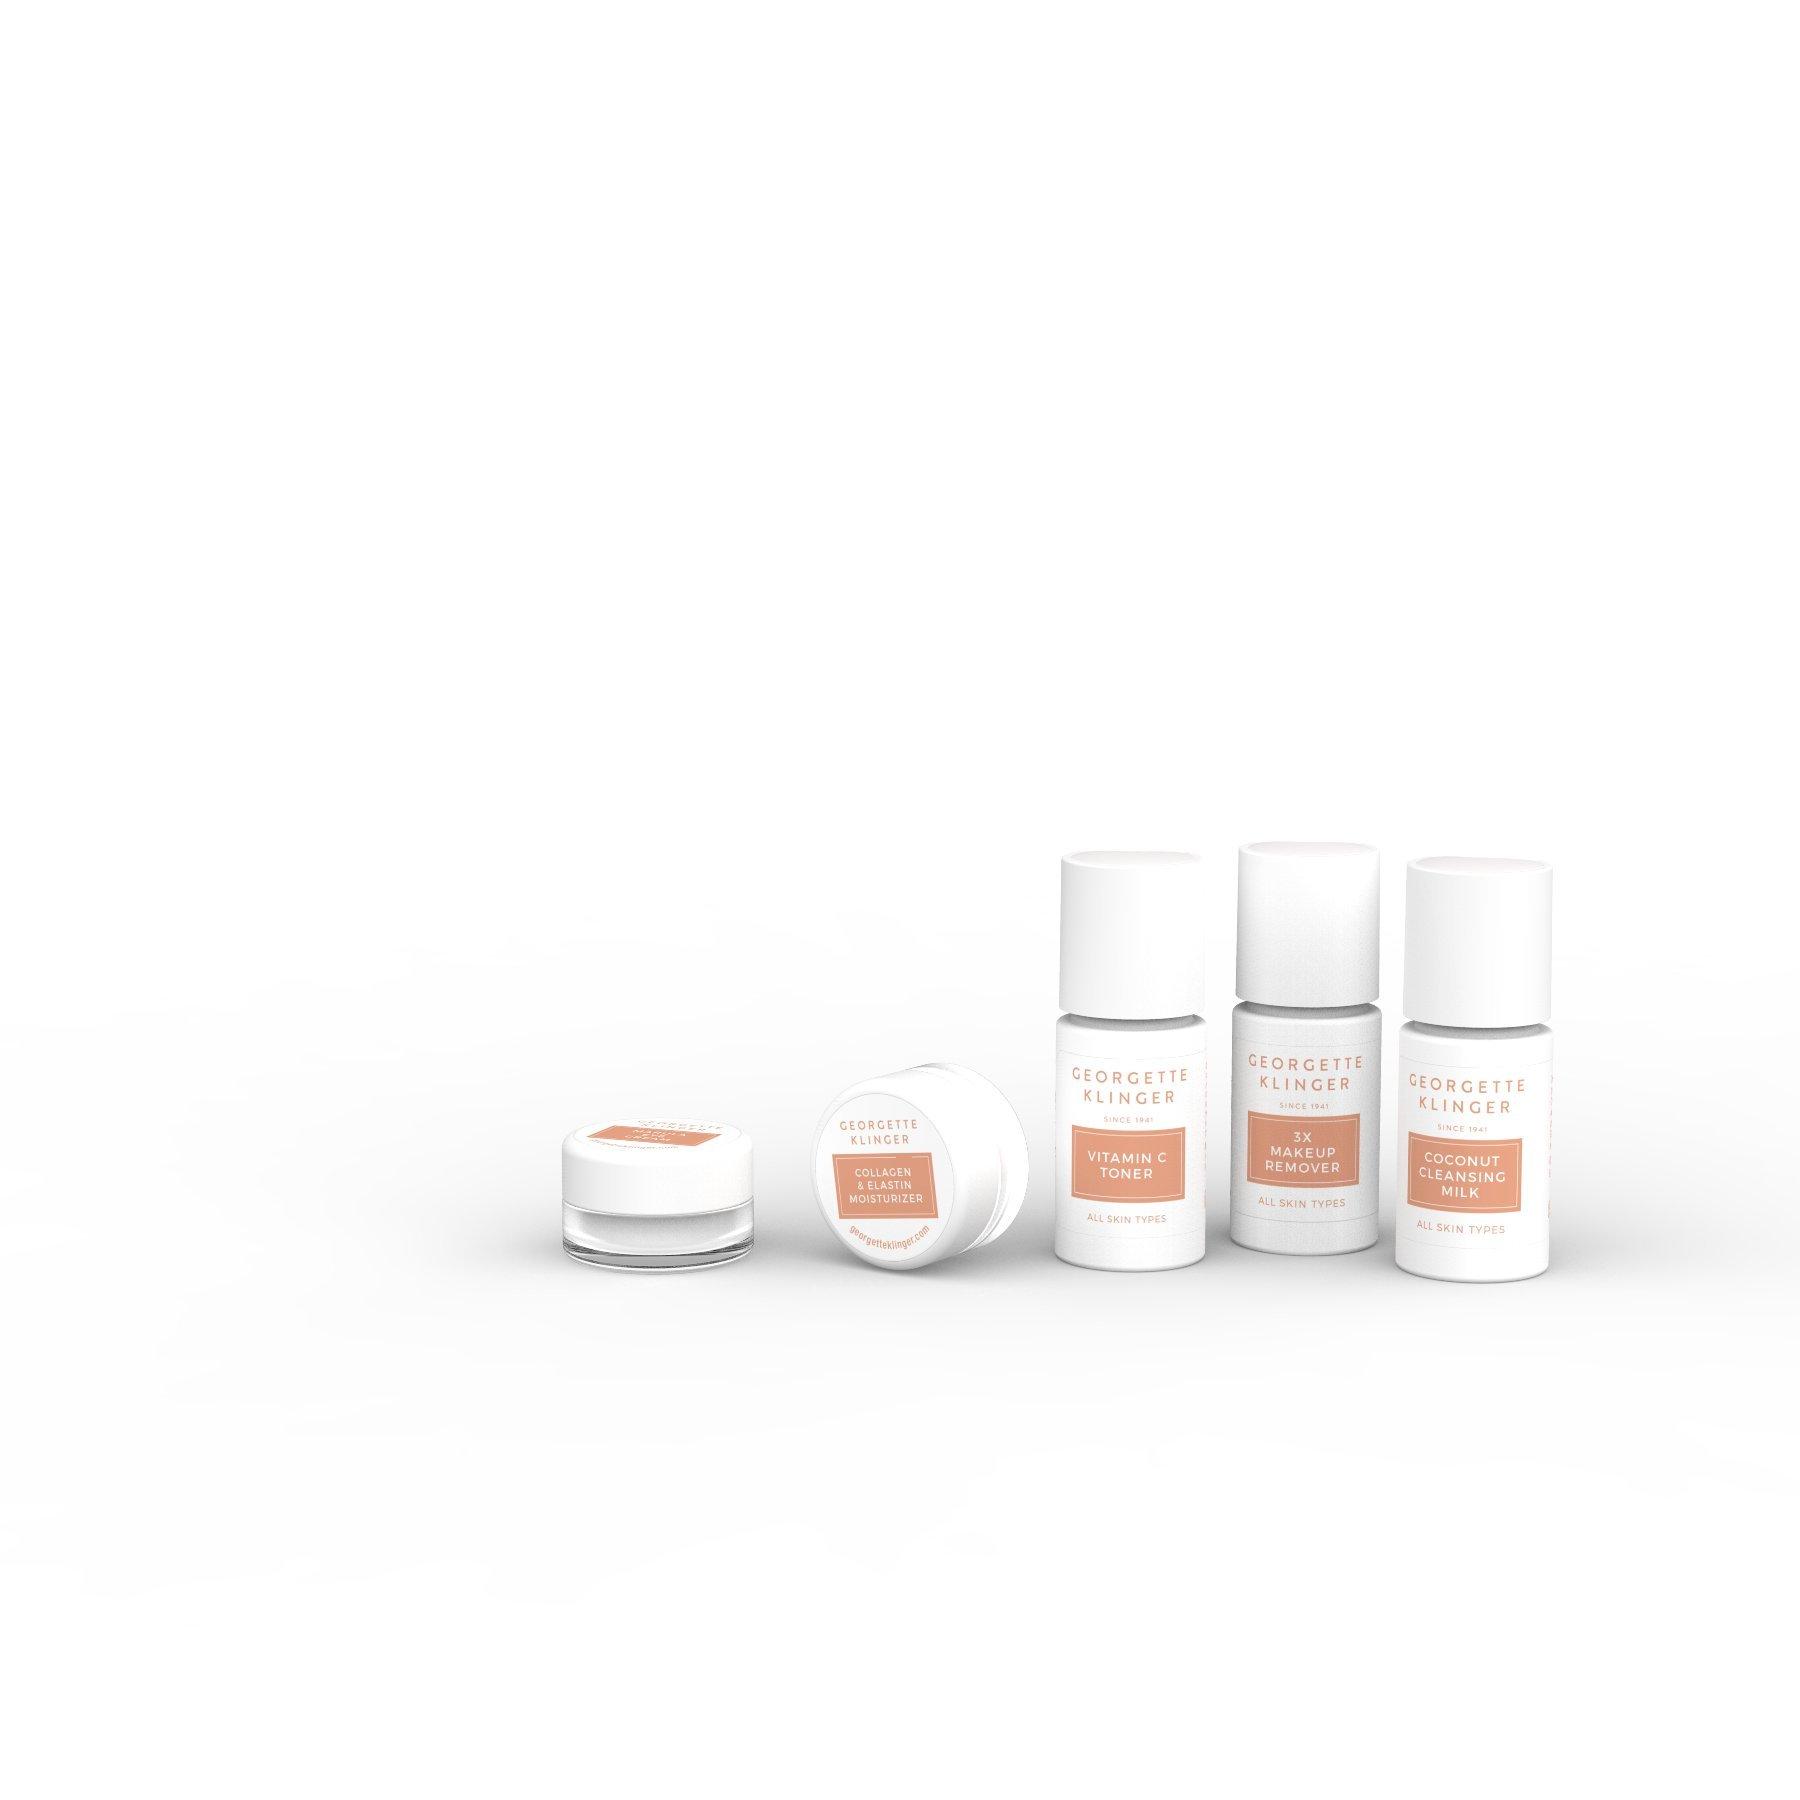 Georgette Klinger 5-Pack Skincare Sample Kit - Travel Size Coconut Cleansing Milk, Vitamin C Toner, 3X Makeup Remover, Collagen & Elastin Moisturizer & Marula Eye Cream